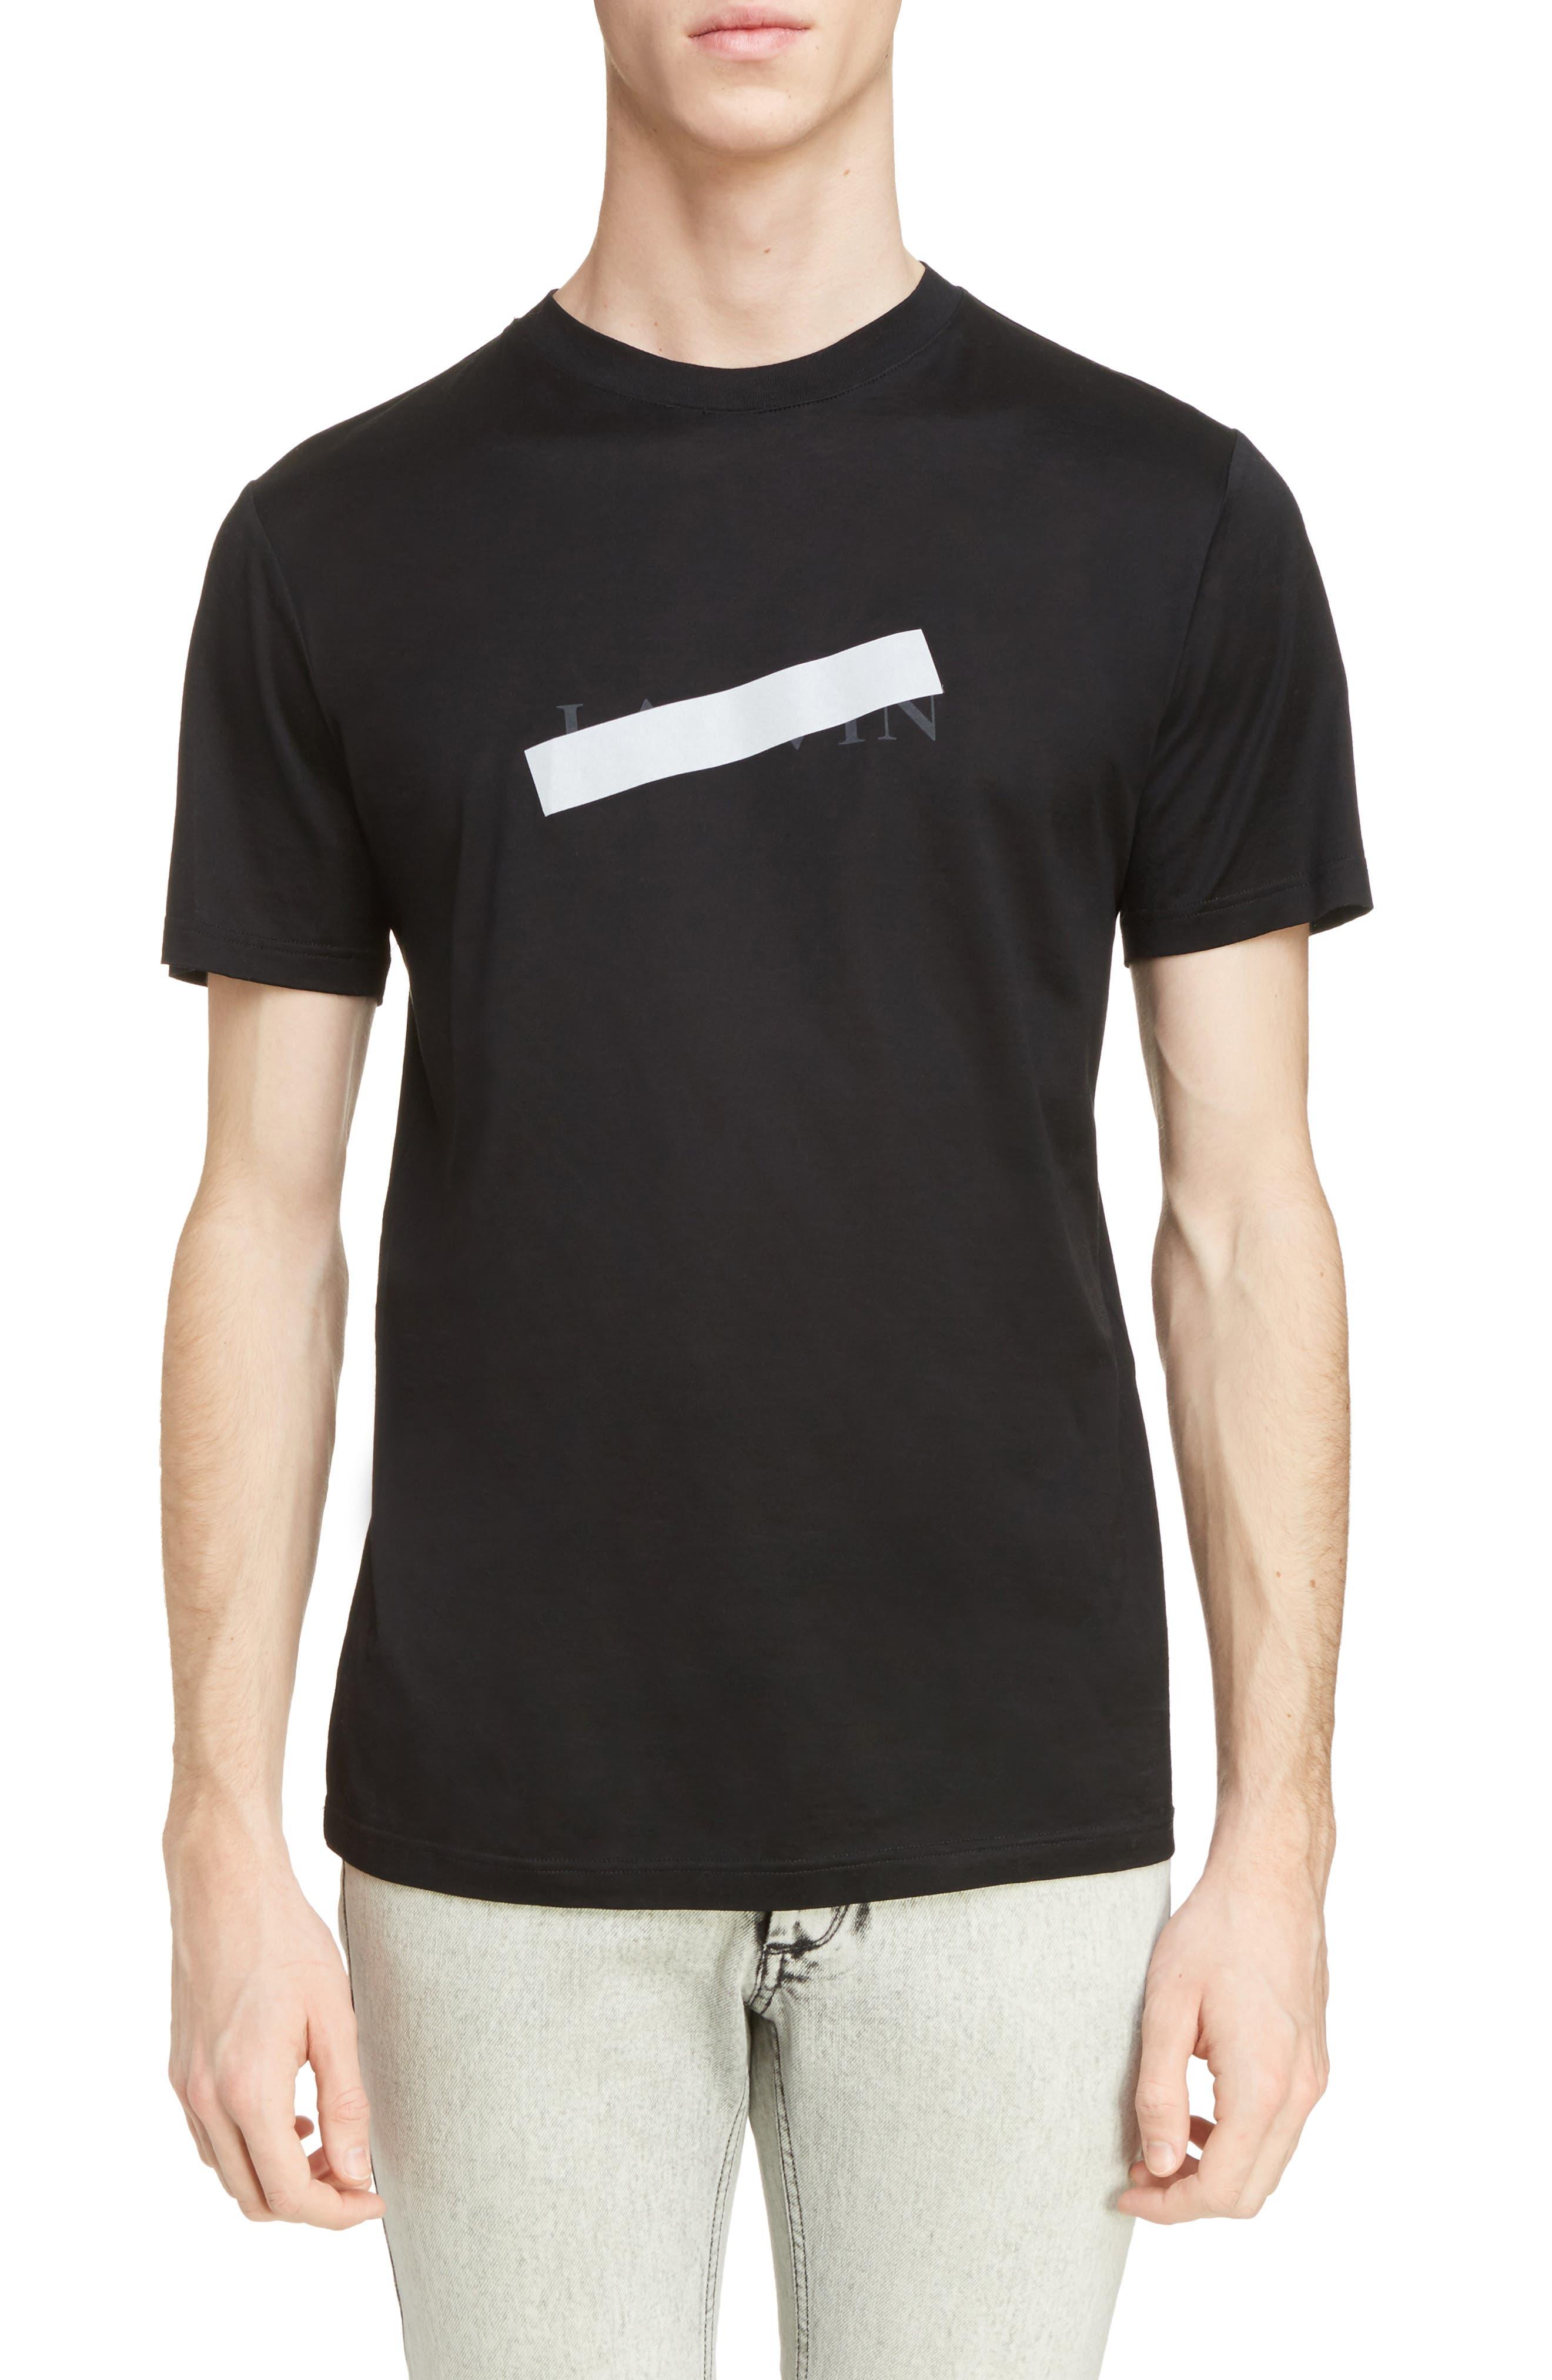 Main Image - Lanvin Reflective Tape Logo T-Shirt